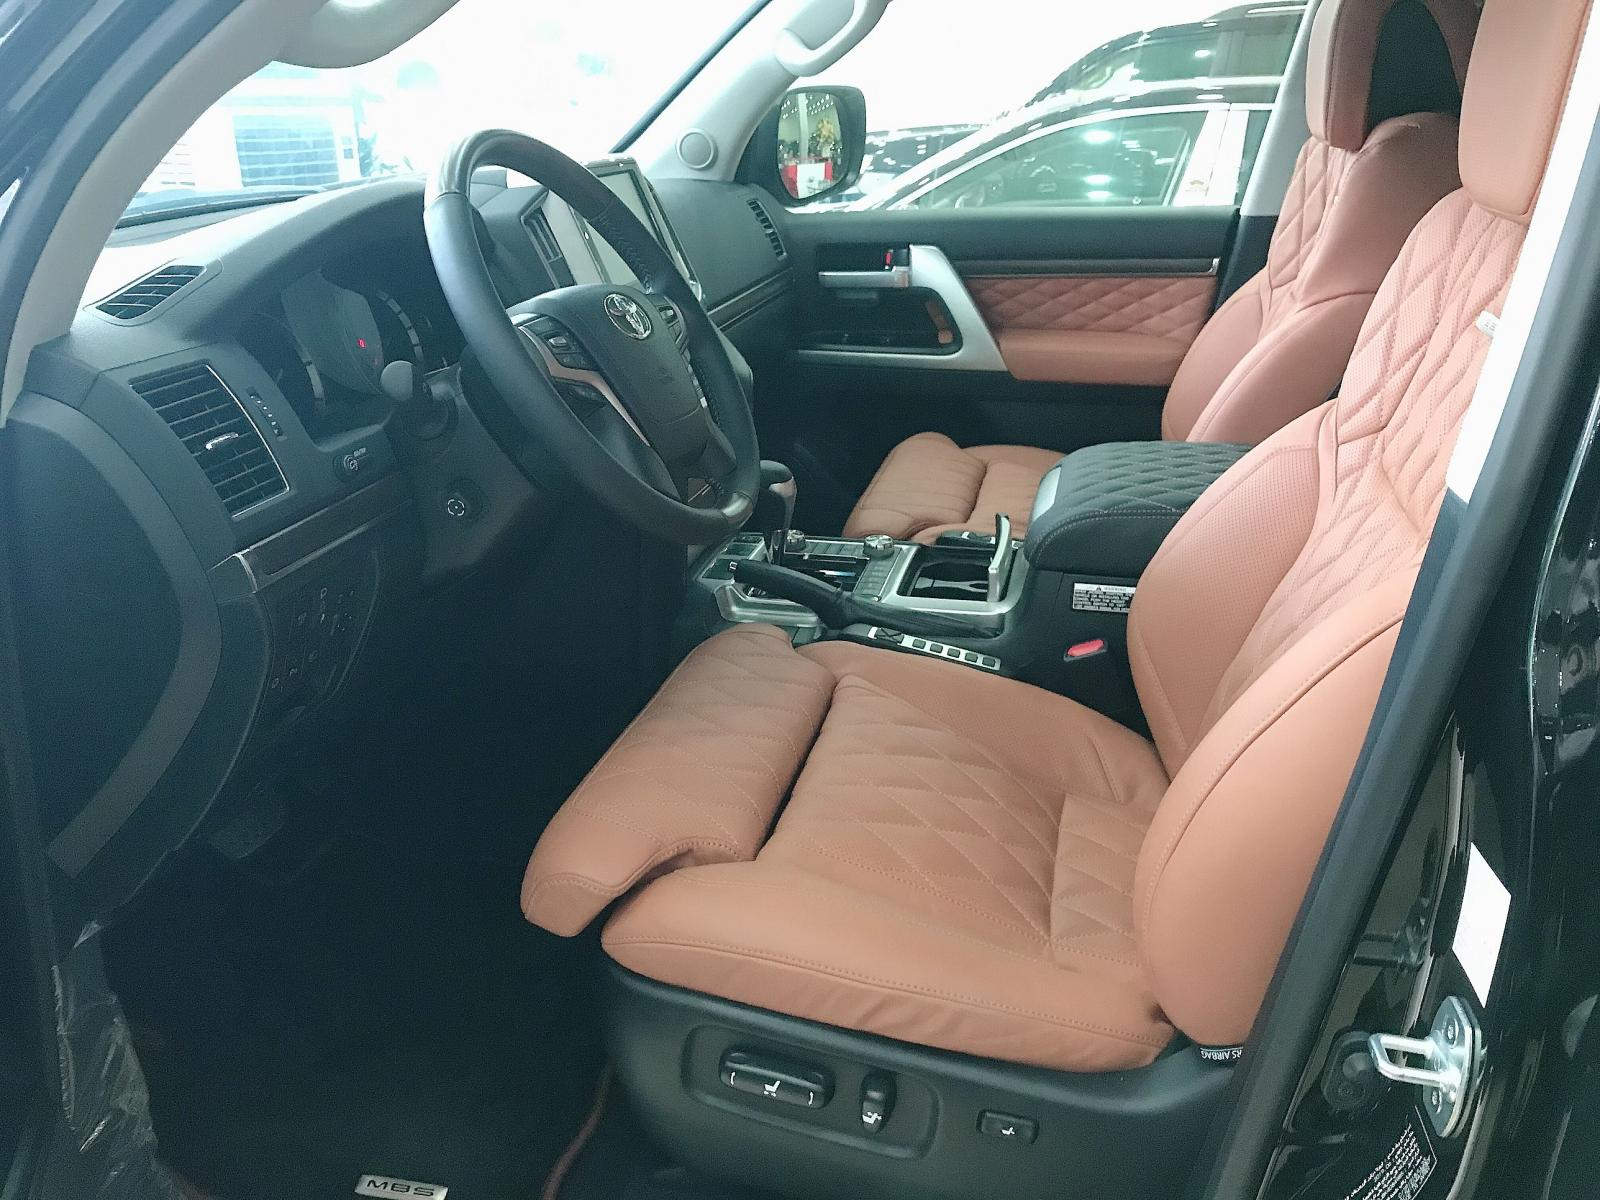 Bán Toyota Landcruise 5.7 VXS, 4 ghế Massge Vip, Model 2020, xe giao ngay